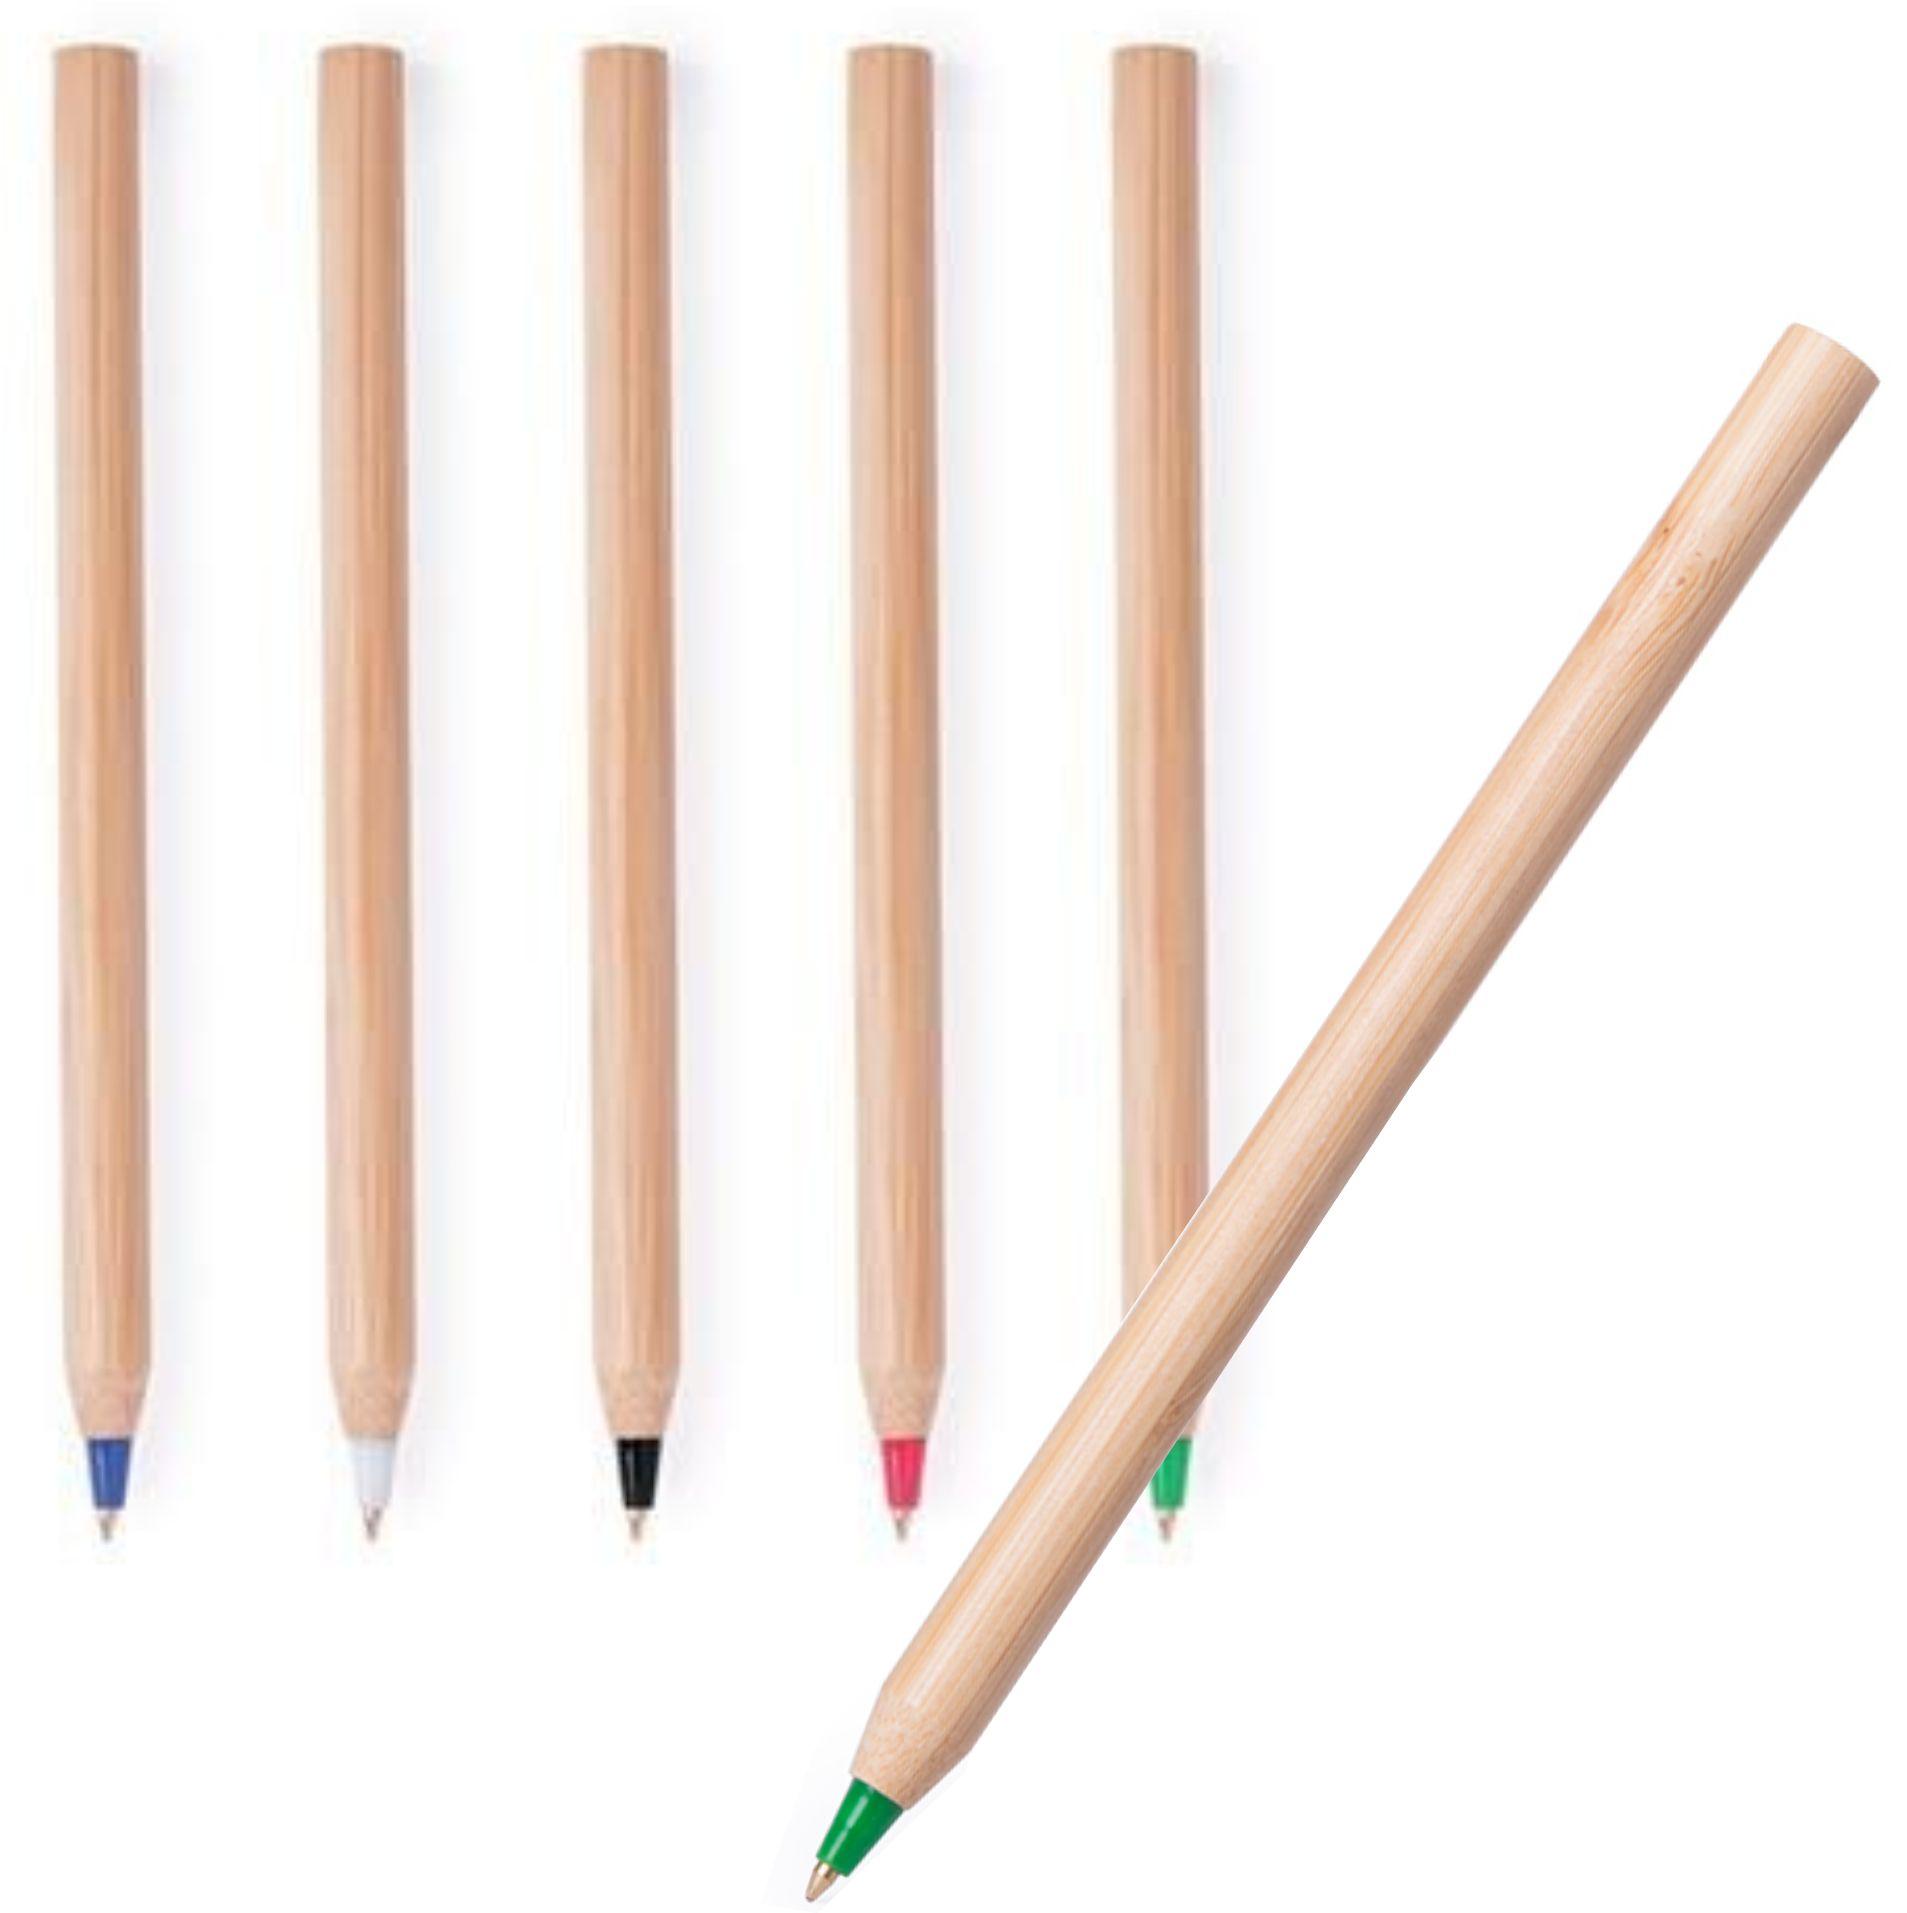 эко ручки с логотипом на заказ